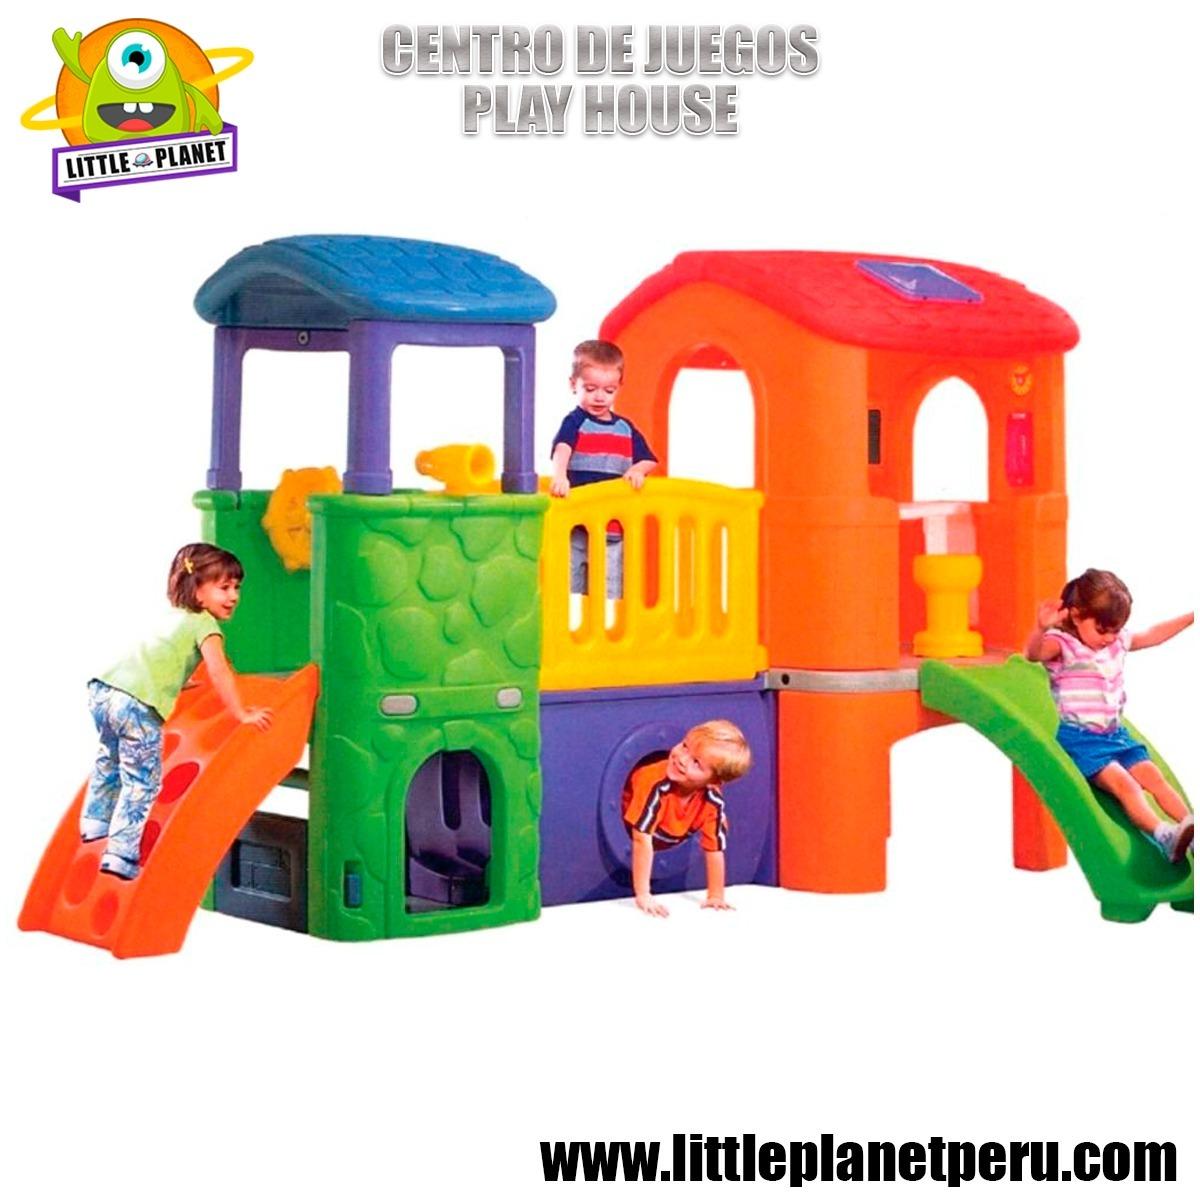 Centro De Juegos Para Ninos Play House Con Resbaladera Tunel S